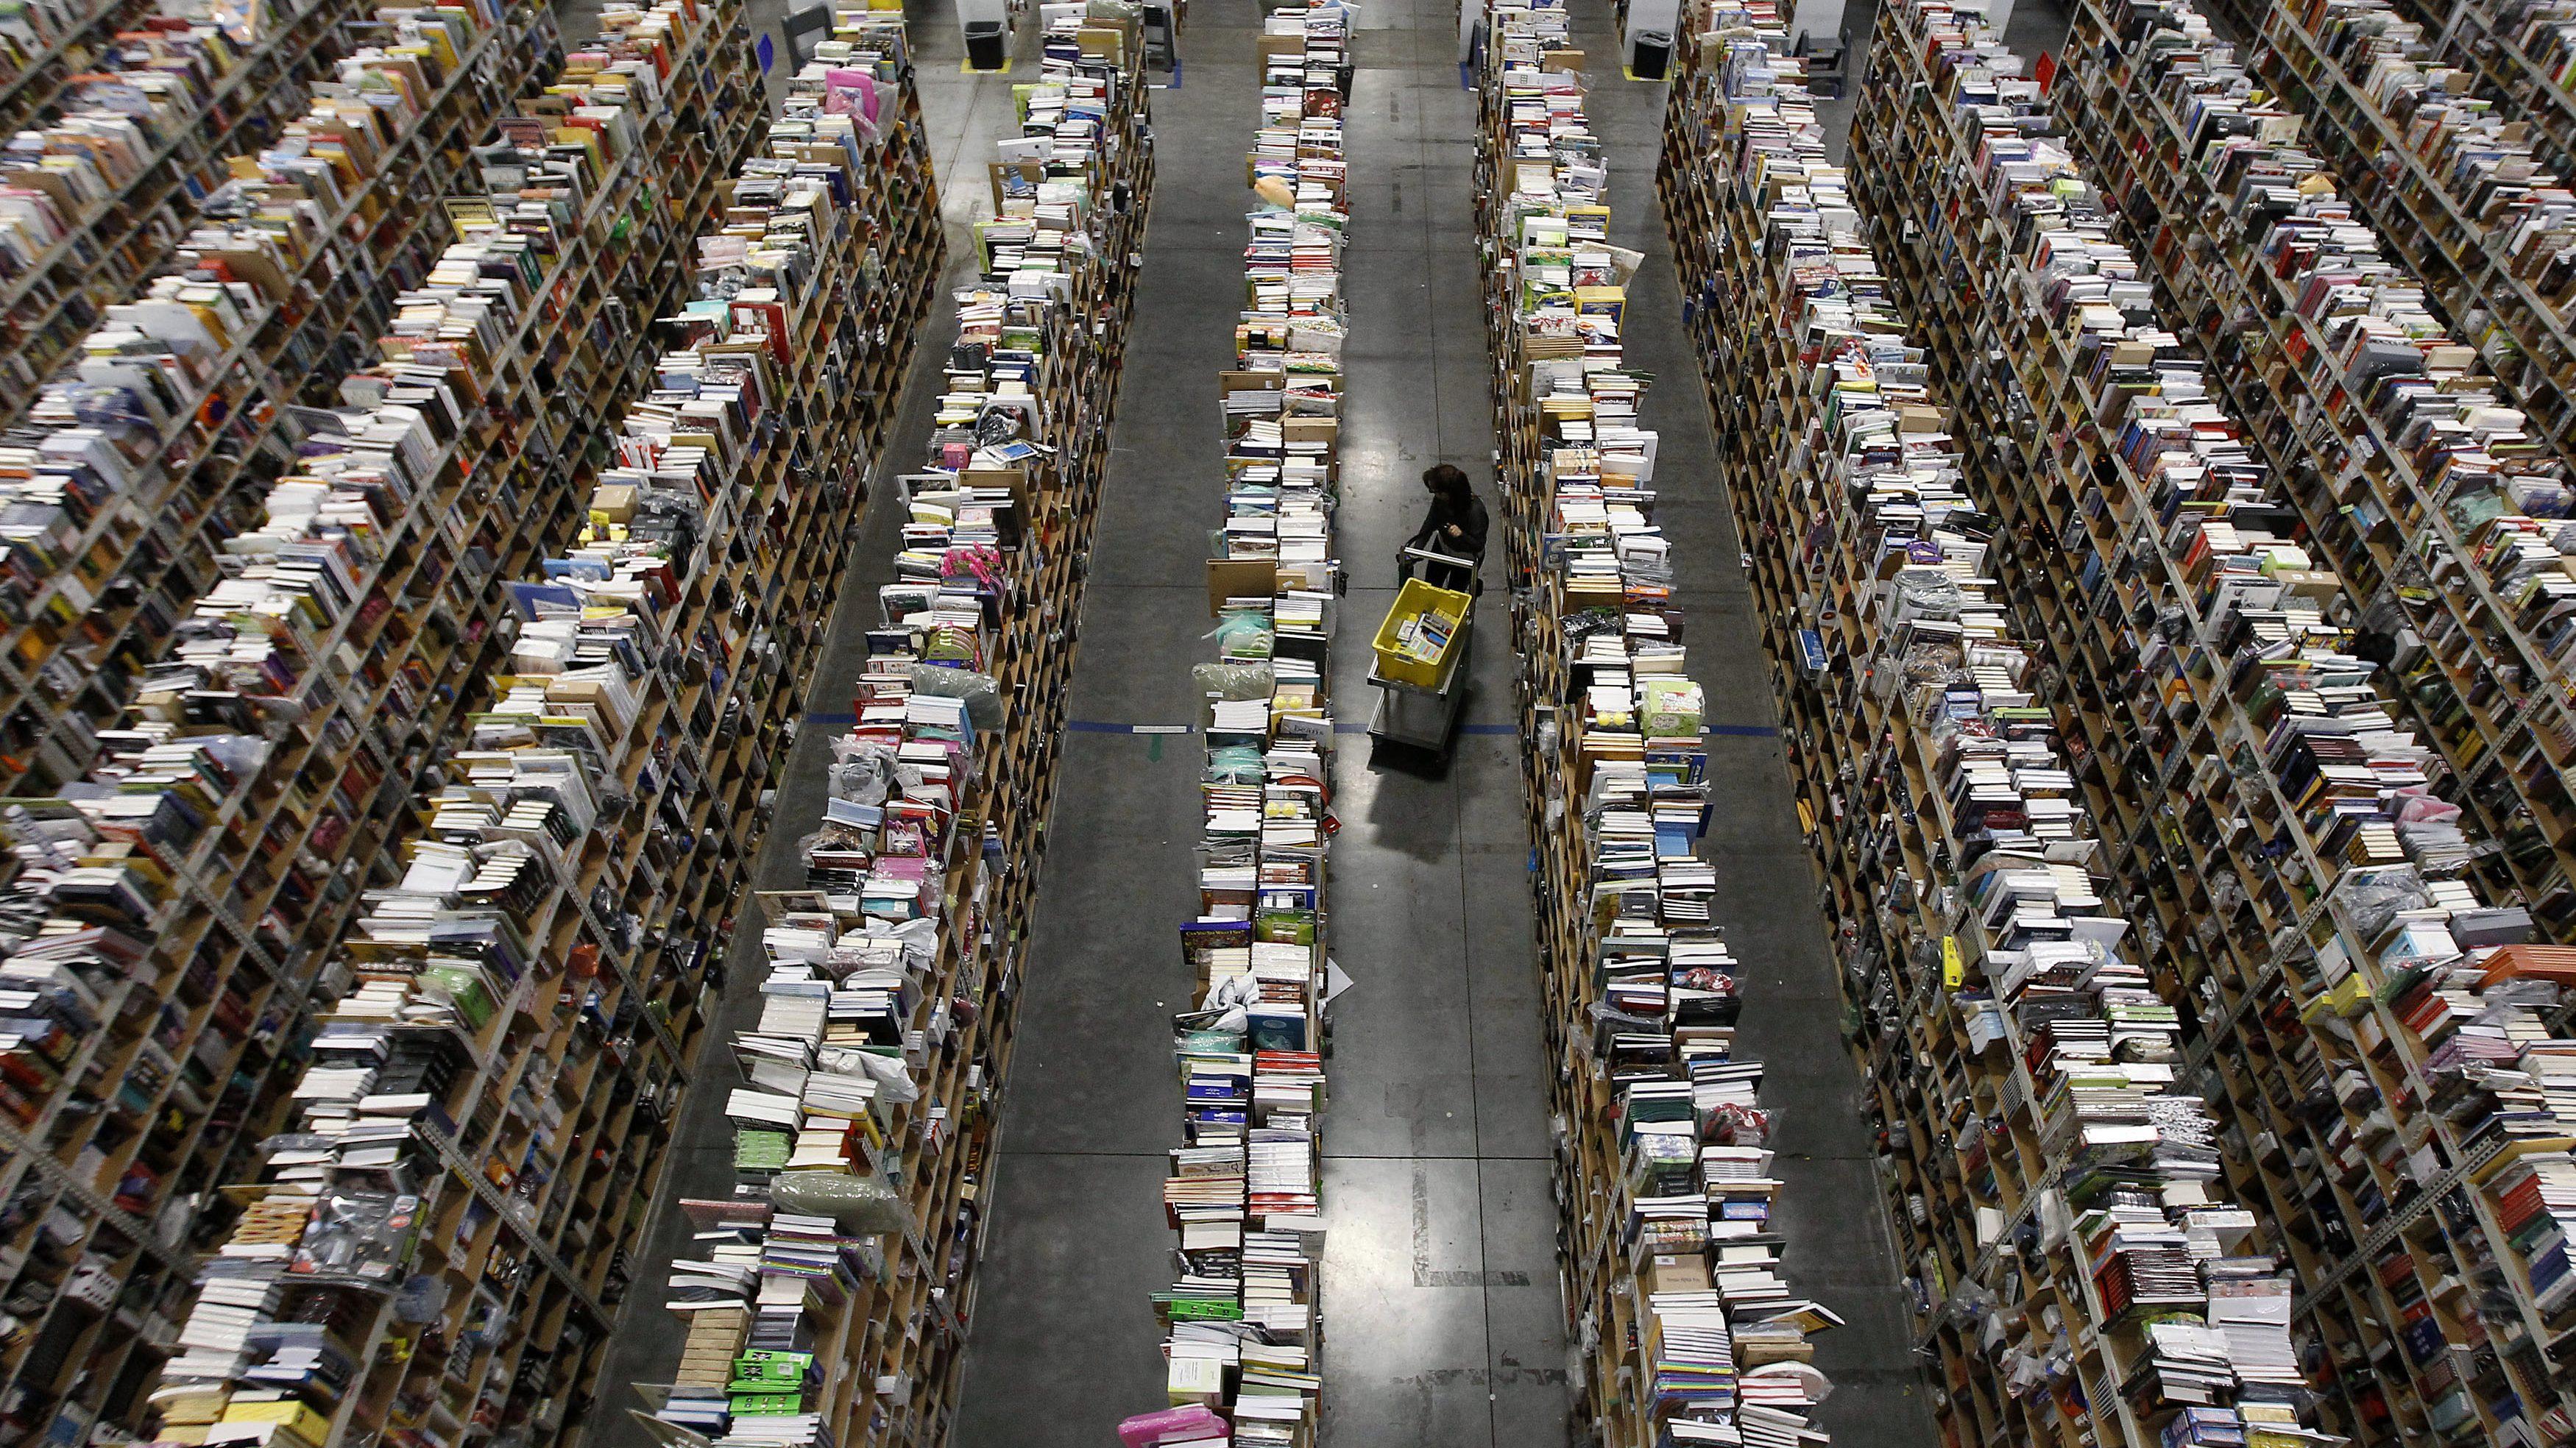 The simple formula Jeff Bezos used to turn Amazon into a $480 billion company